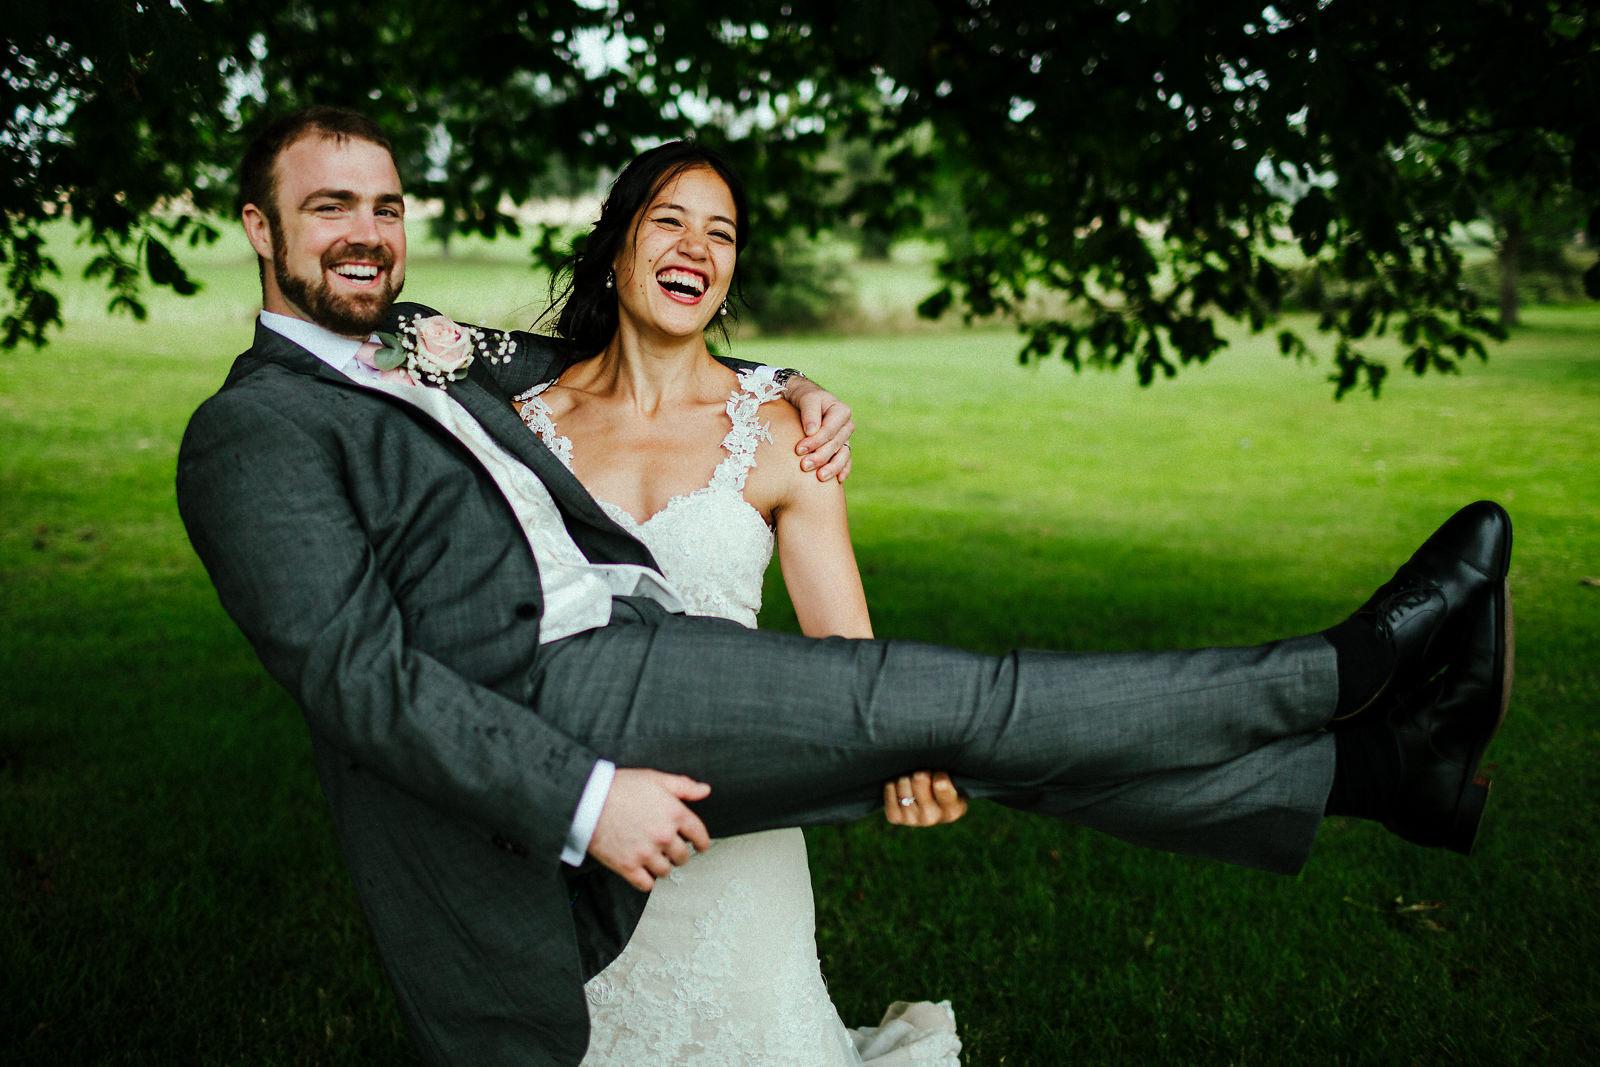 Orchardleigh Walled Garden wedding photographer